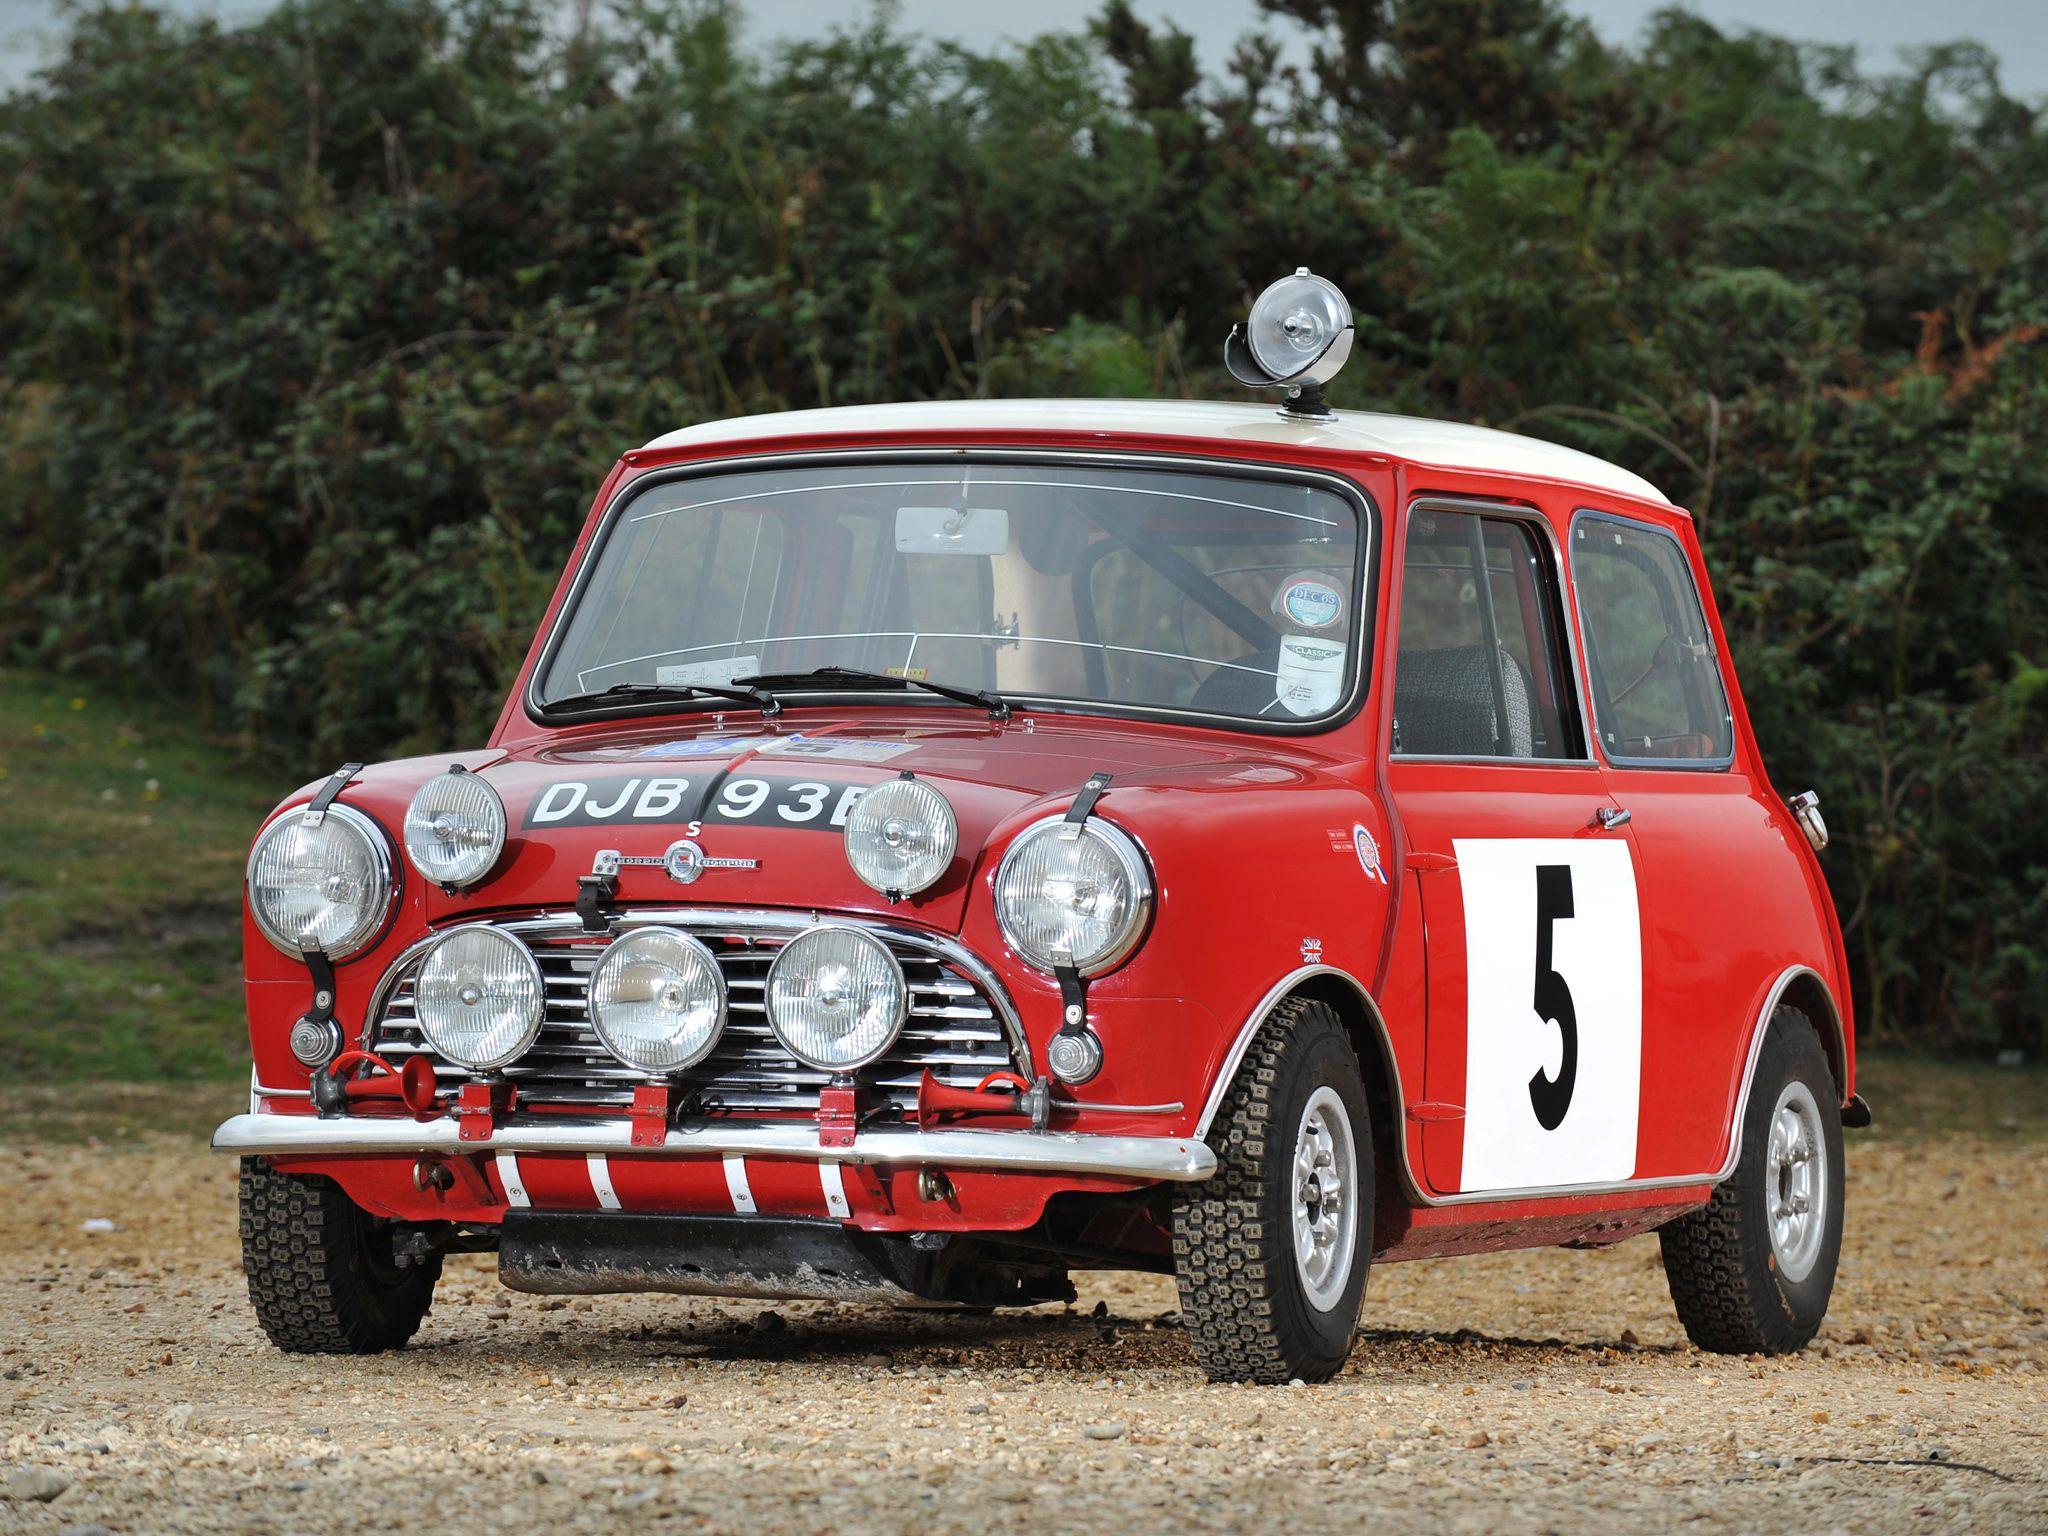 Mini Rally Car | Vehicles | Pinterest | Rally, Rally car and Cars